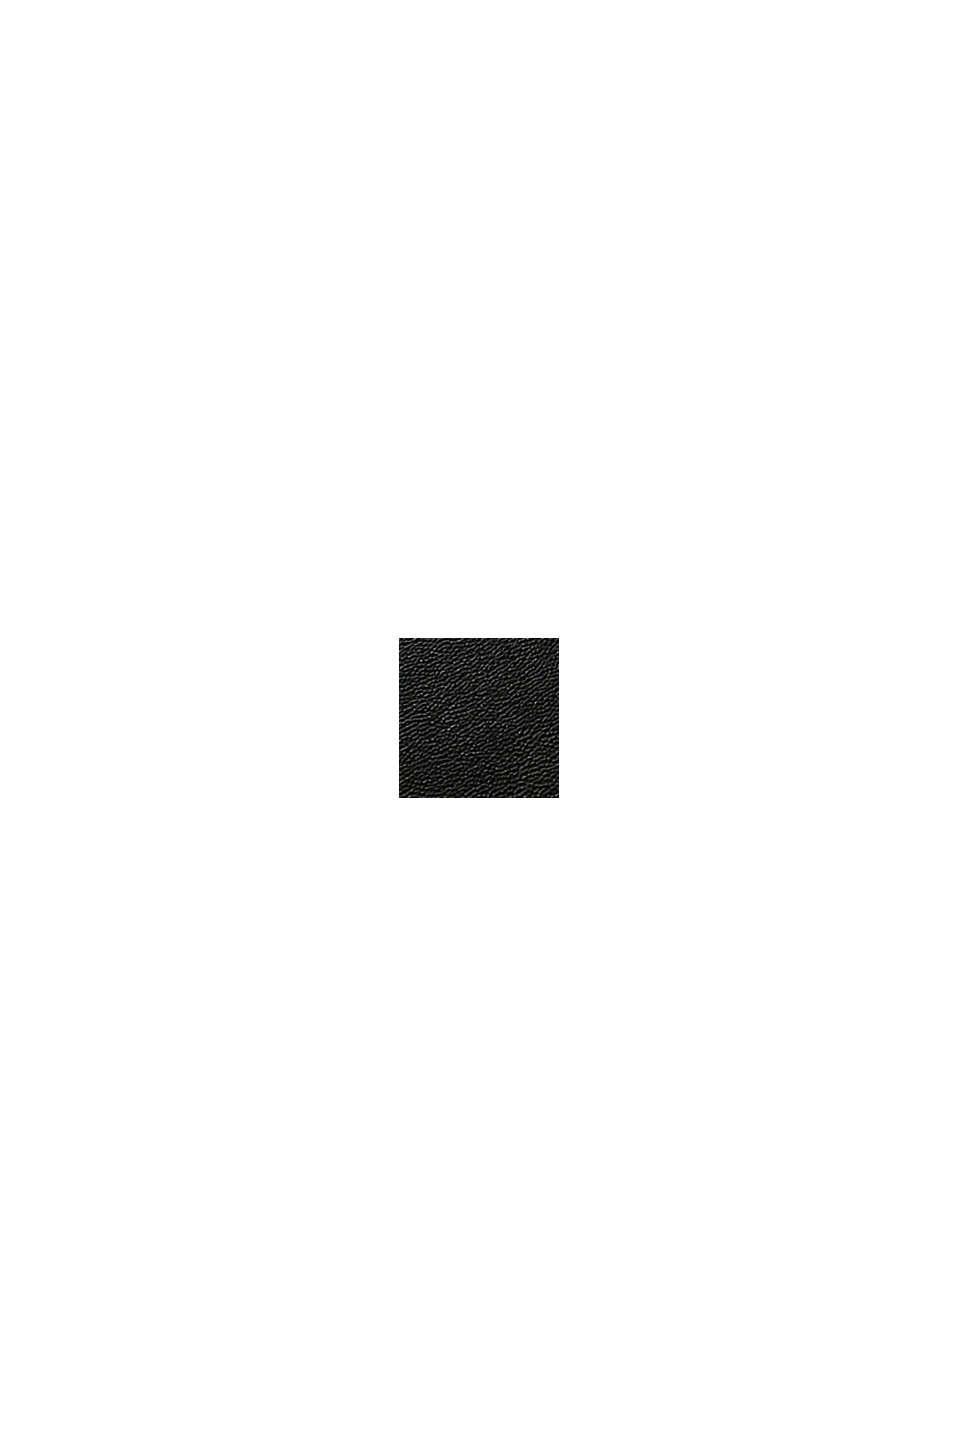 Vegansk: axelremsväska med monogram, BLACK, swatch